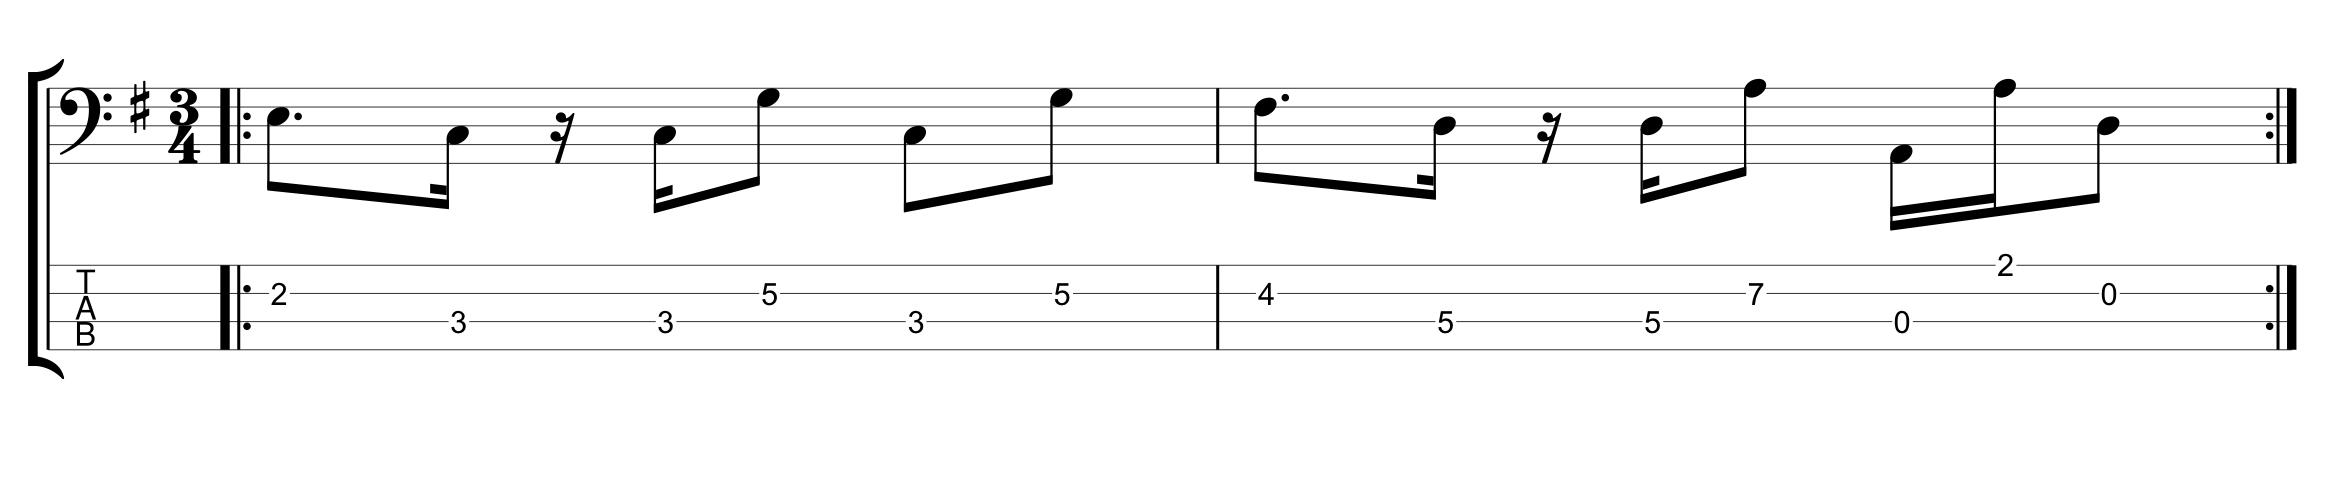 Odd Meter 3/4 Example